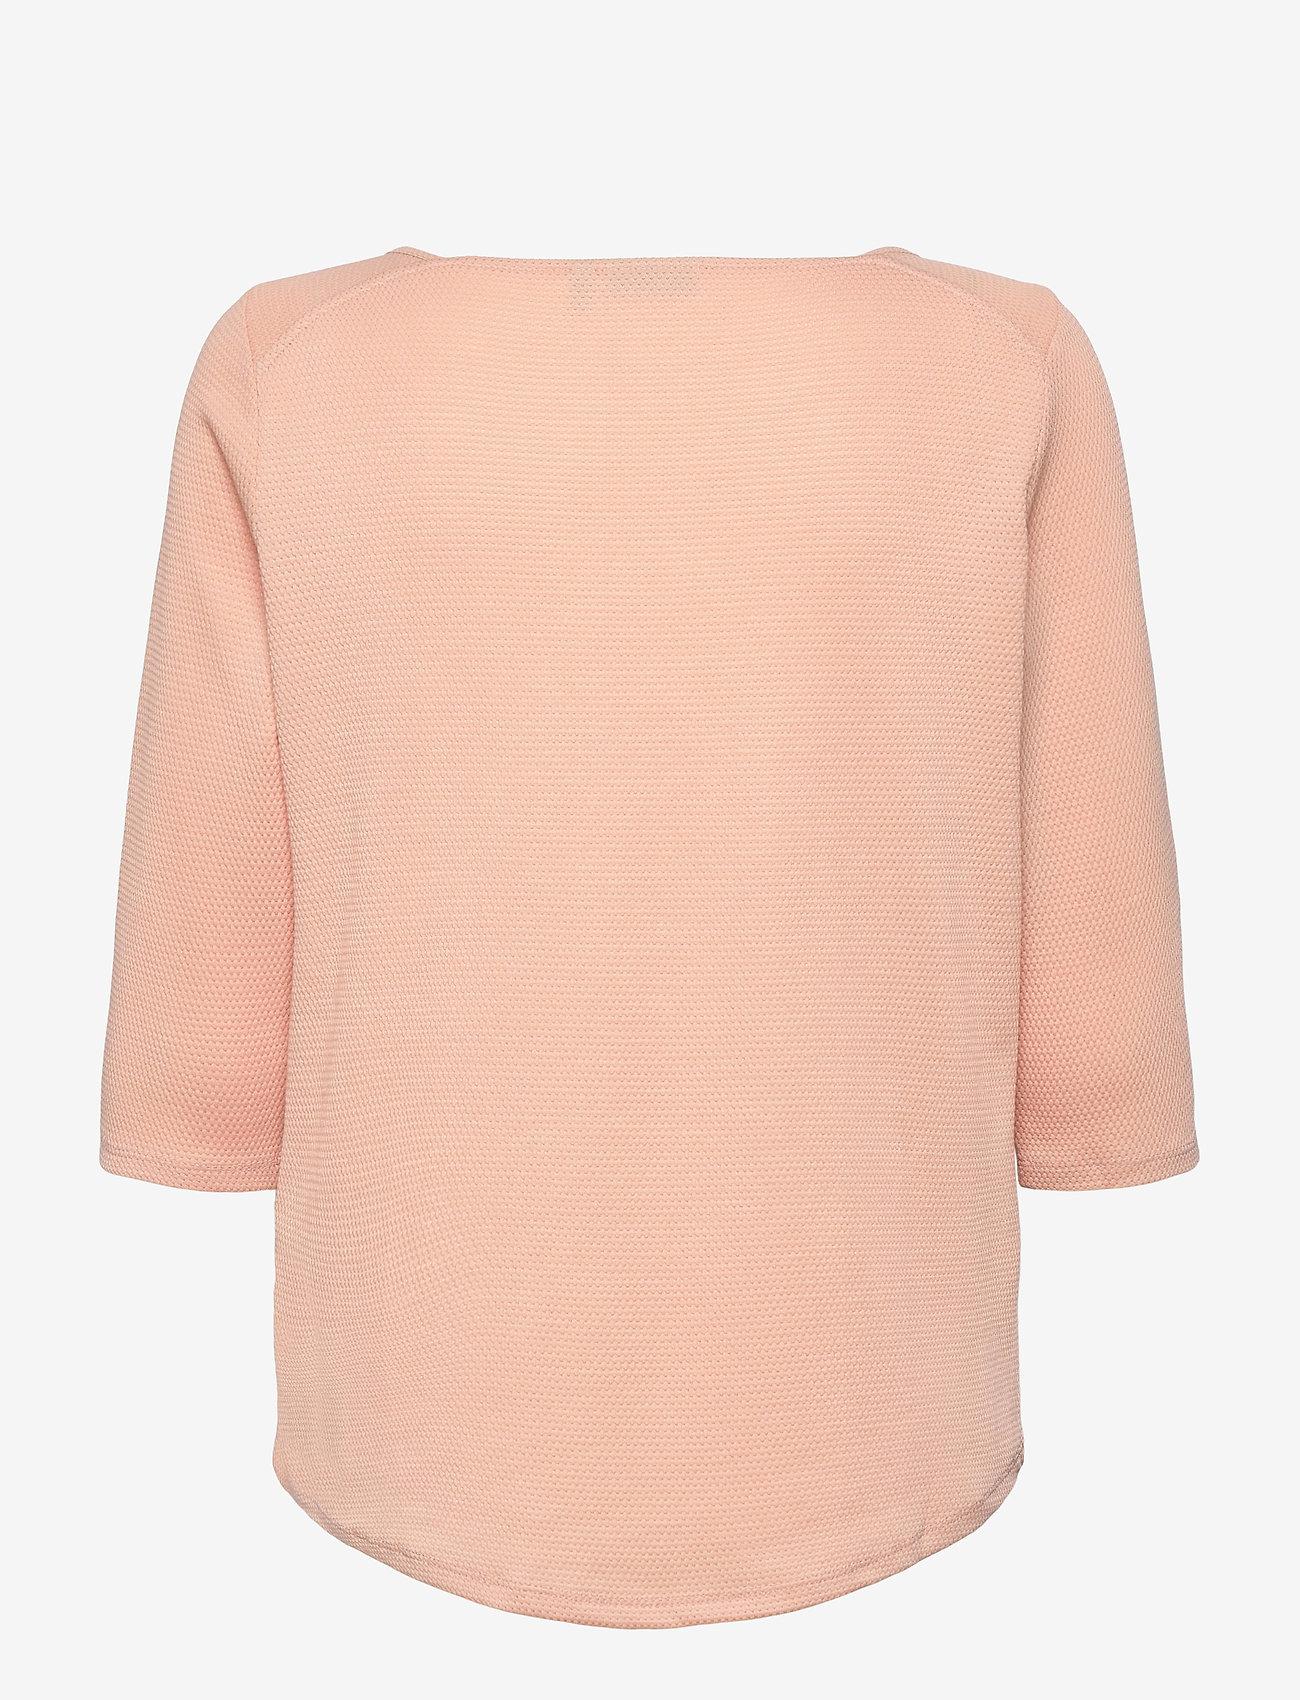 Fransa - FRPEJACQ 1 T-shirt - pitkähihaiset t-paidat - misty rose - 1